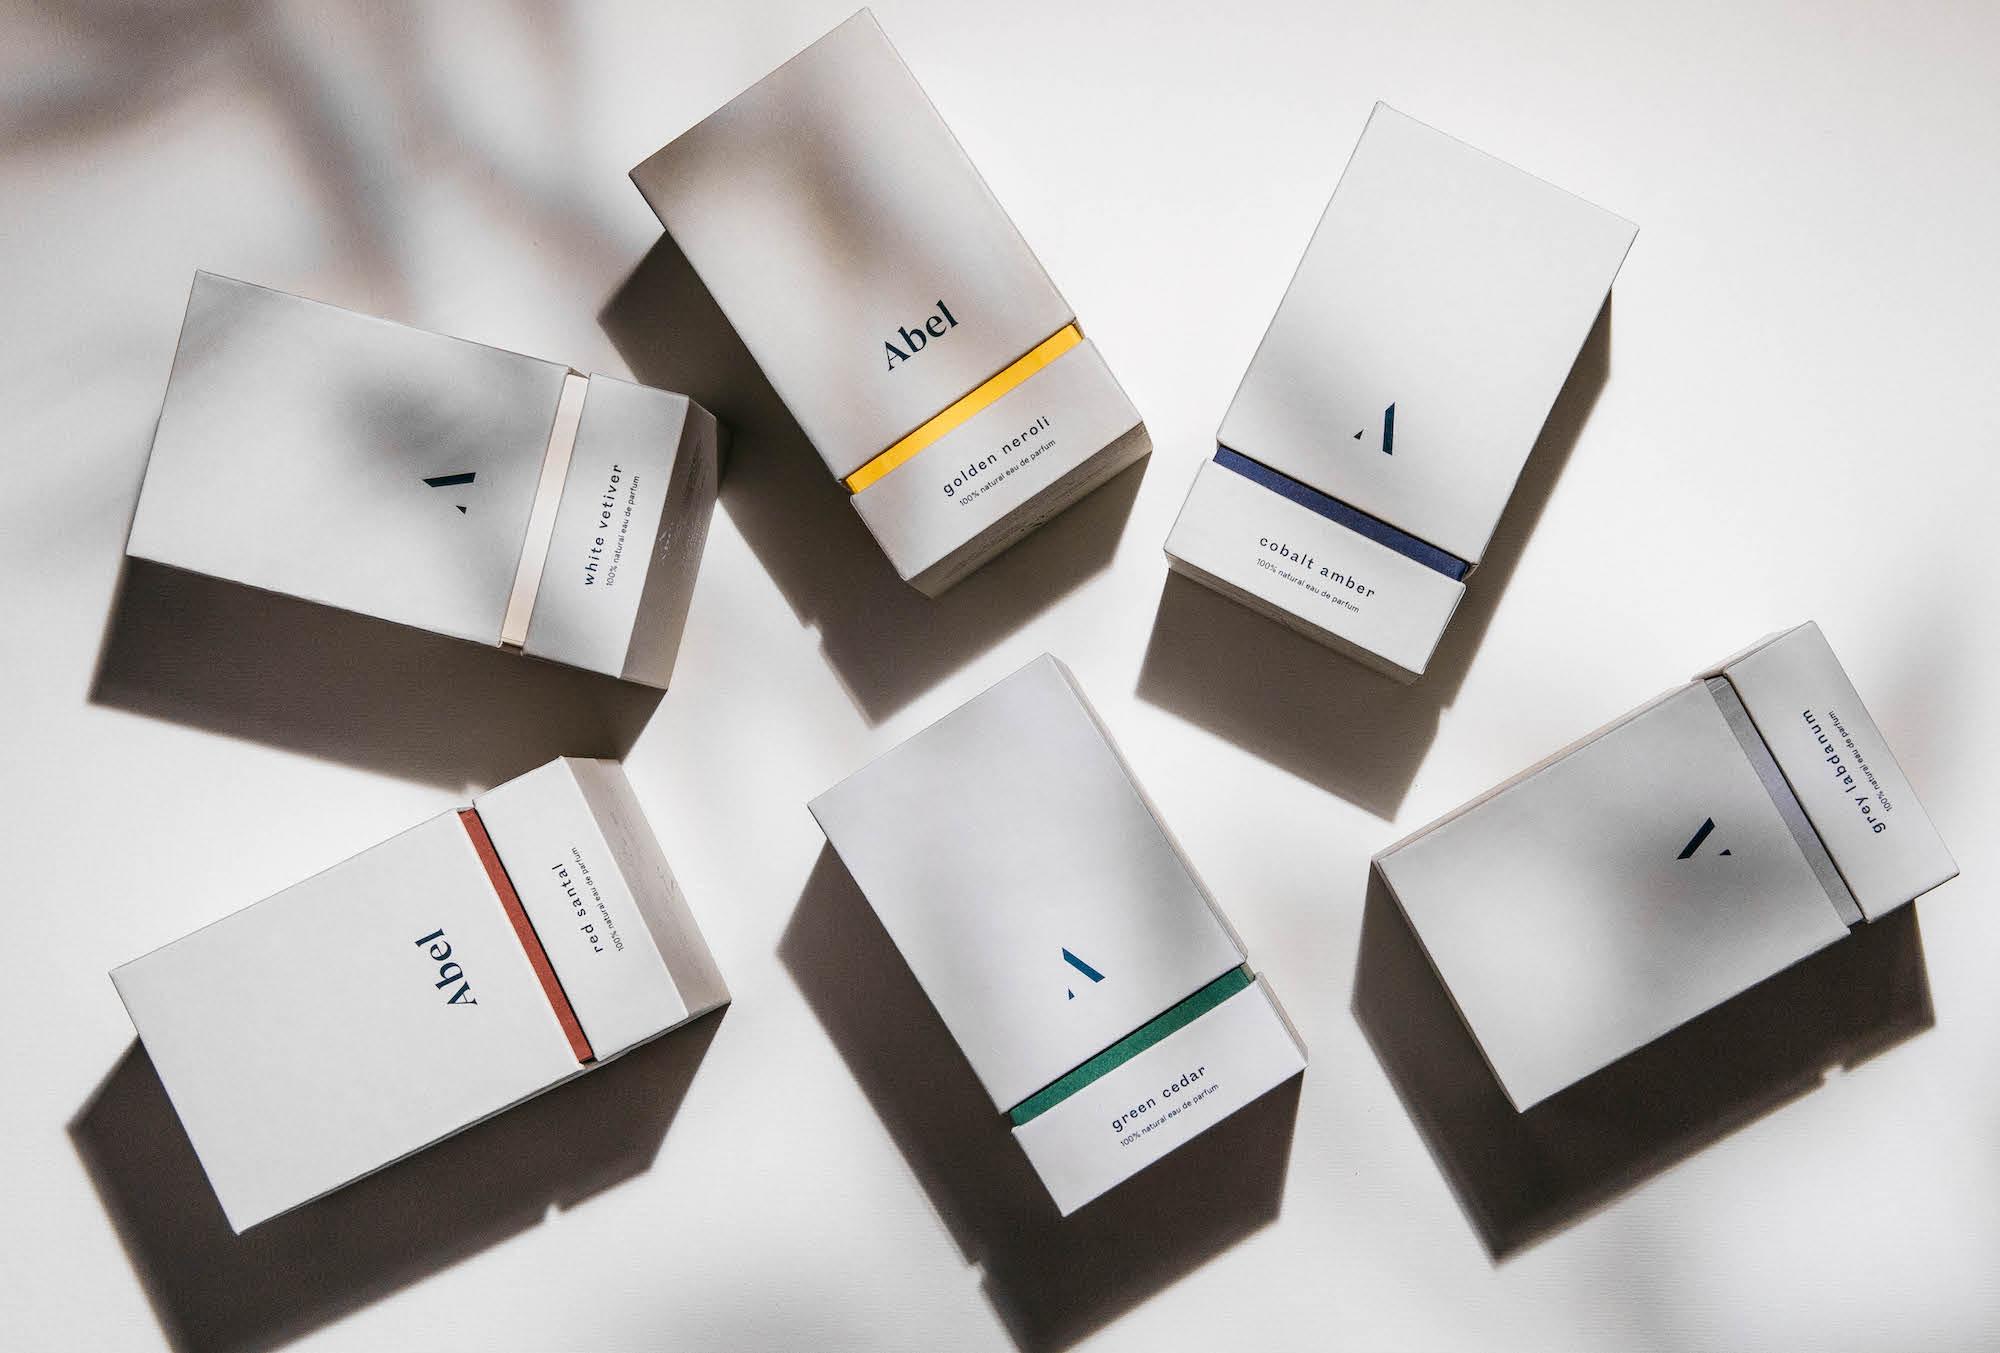 sniph-perfume-blog-abel-odor-natural-perfumery